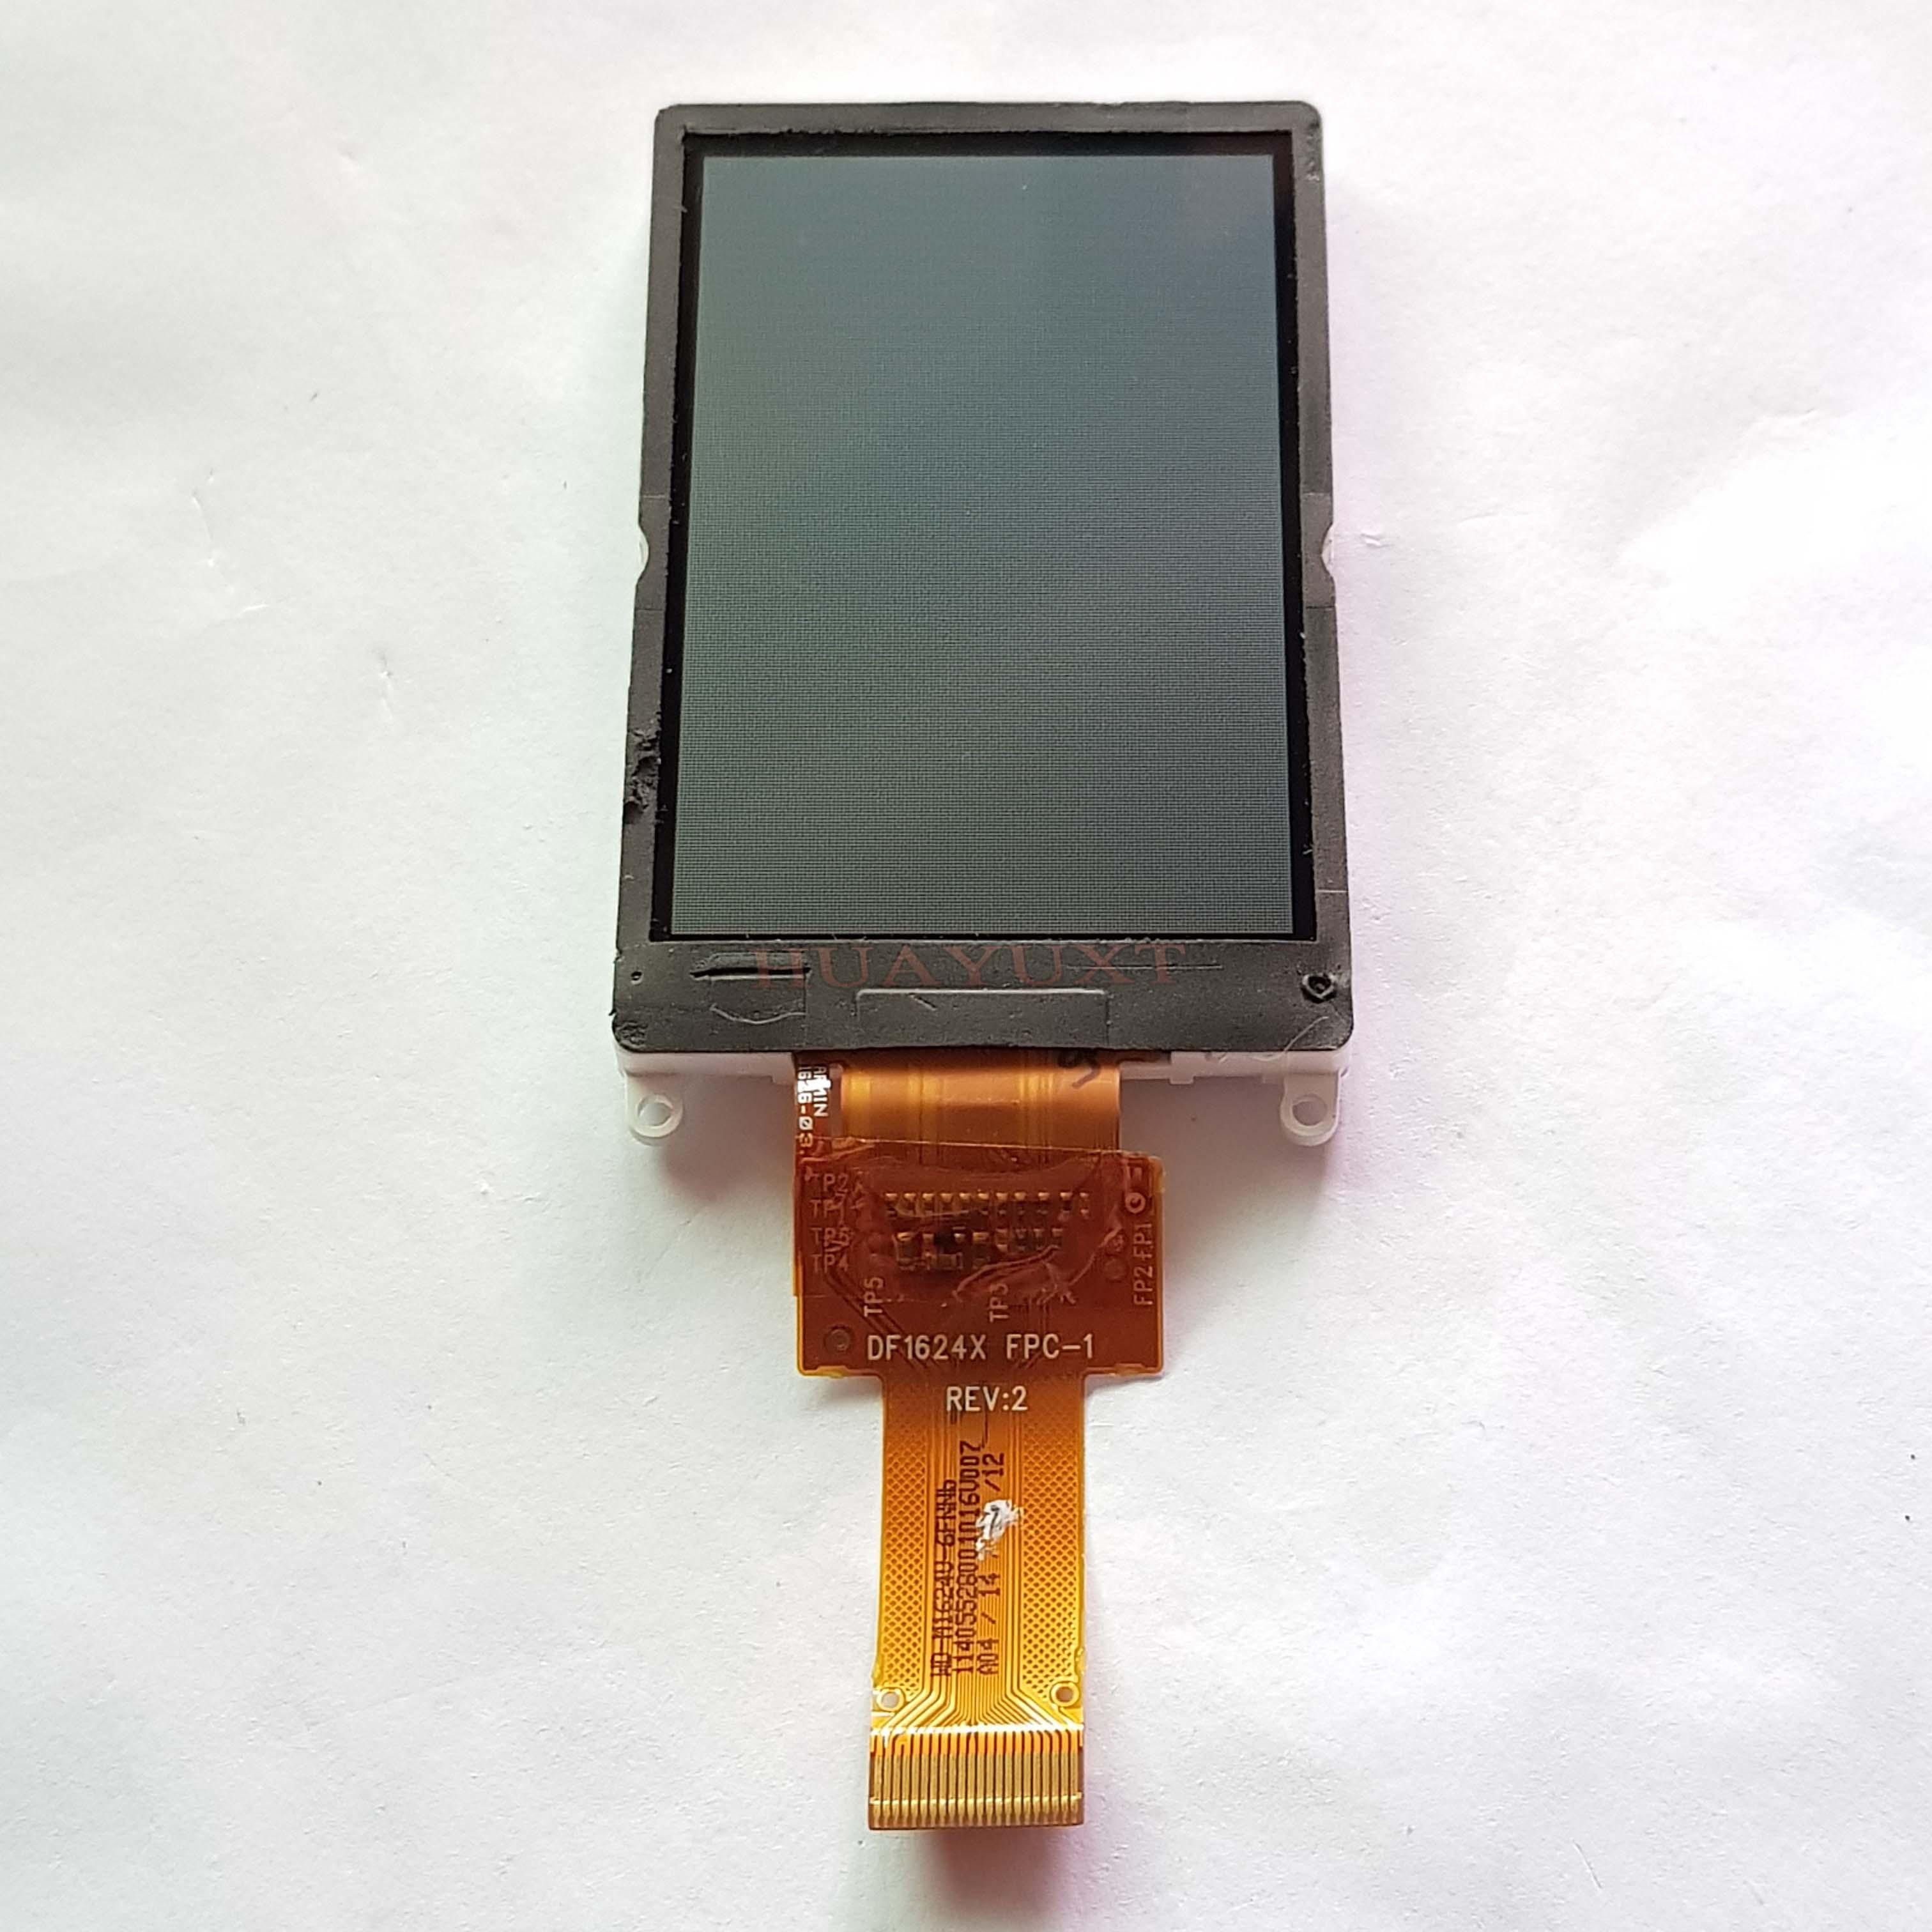 Cronômetro de Bicicleta Medidor de Velocidade de Bicicleta Painel de Substituição Tela de Reparo Lcd para Garmin Tela Edge Display Lcd 810 Gps